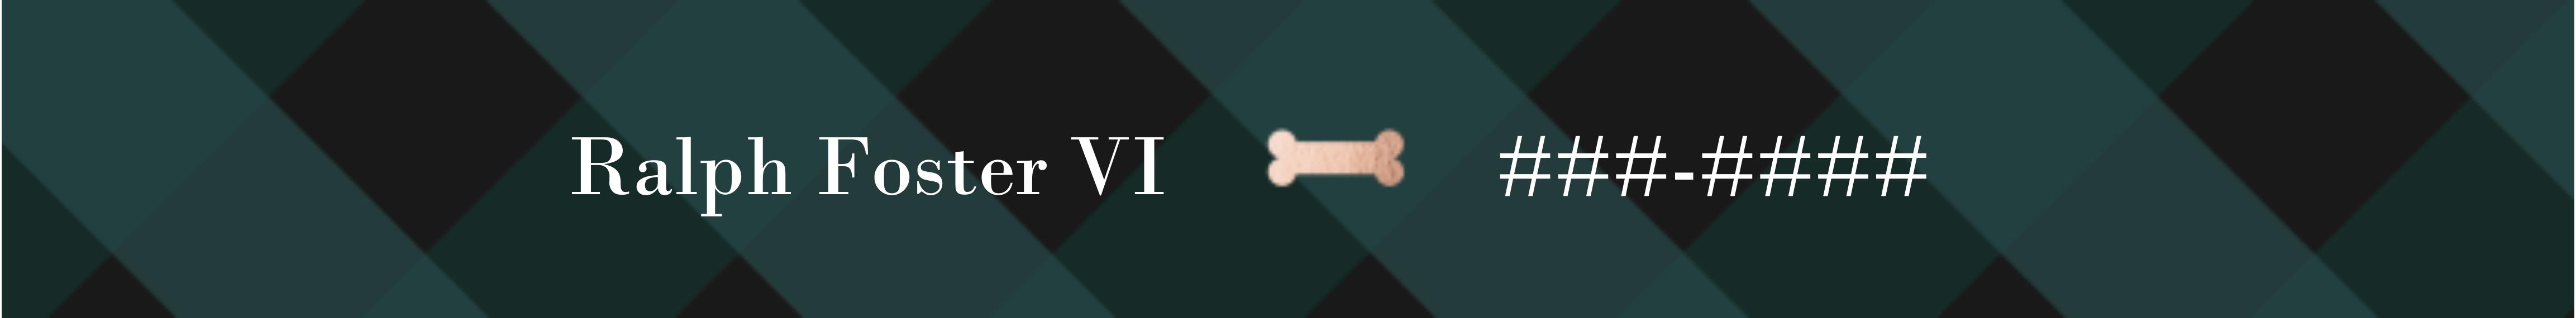 Featured Large Pet Collar, Gift -Dapper Dog